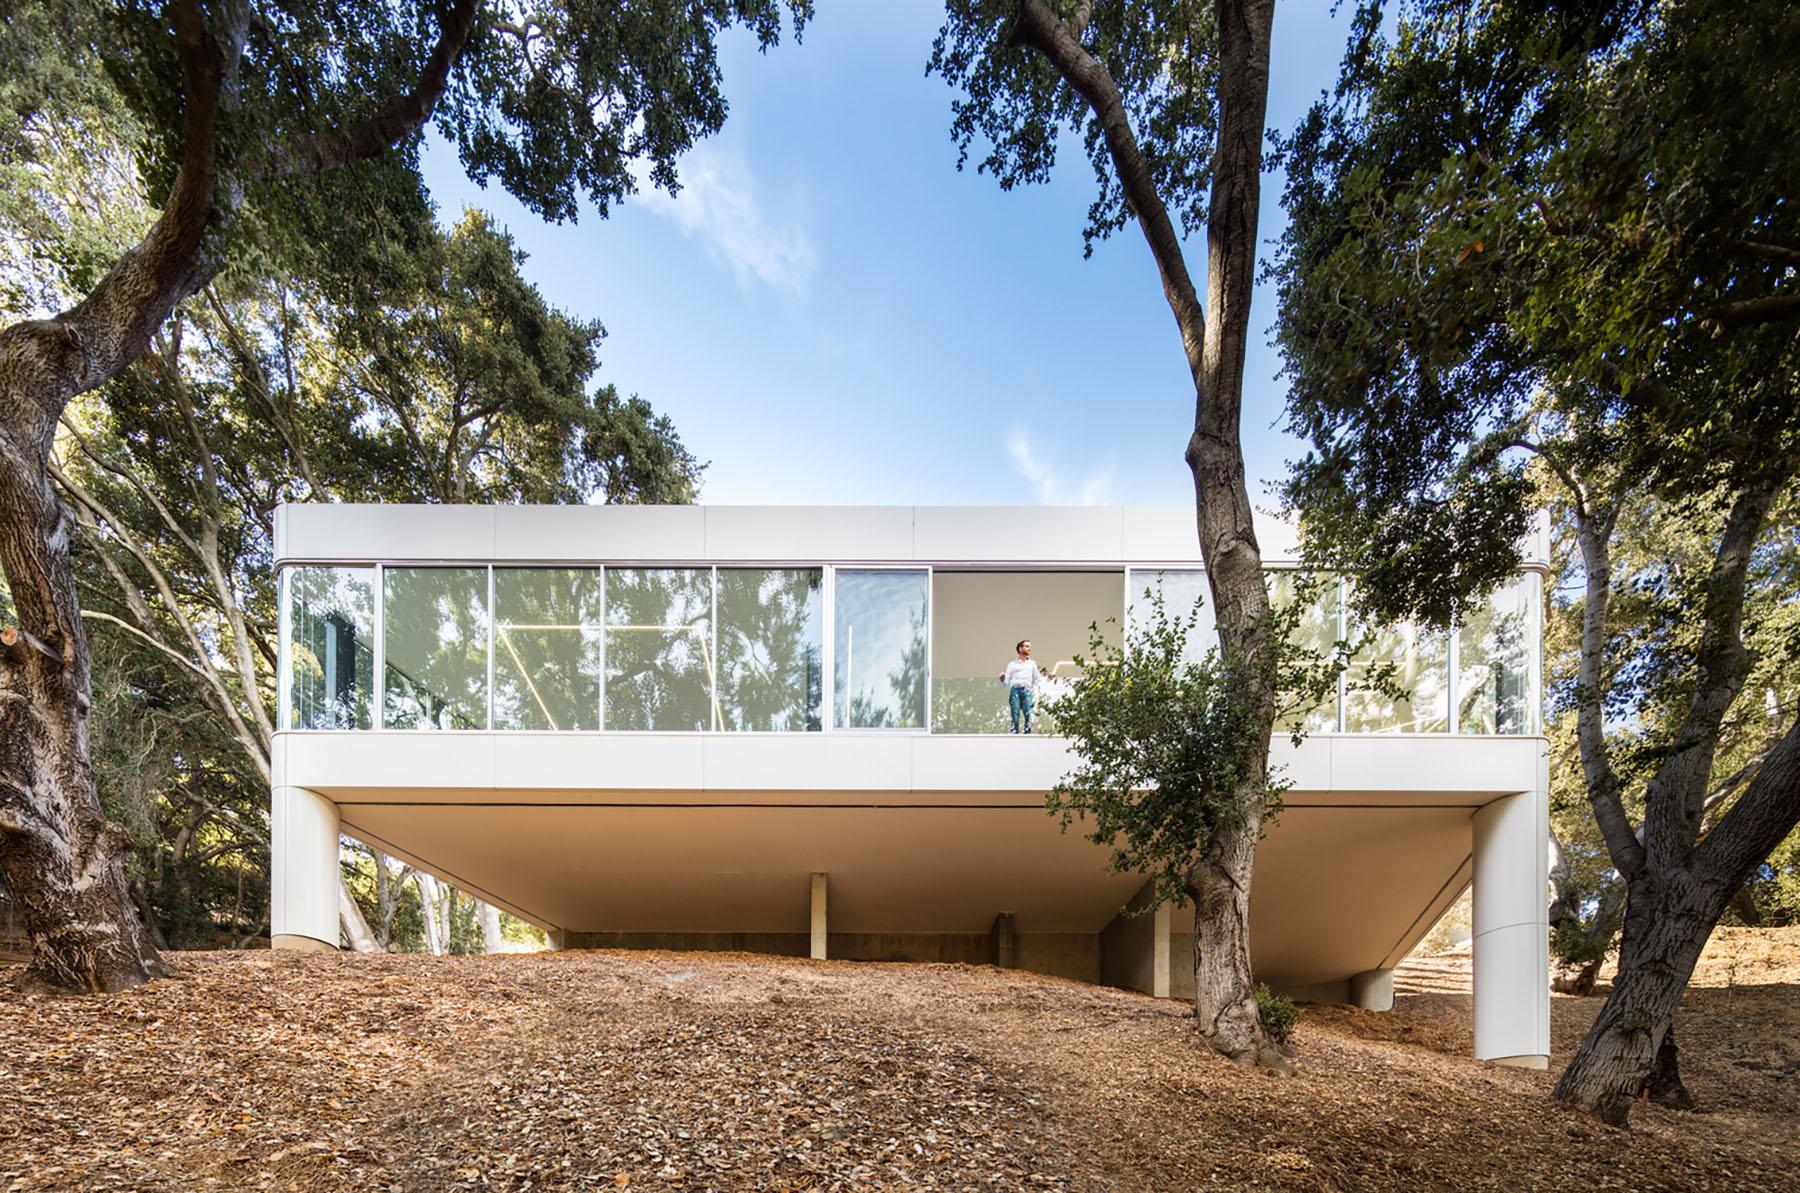 iGNANT-Architecture-Craig-Steely-Pam-Pauls-House-001b